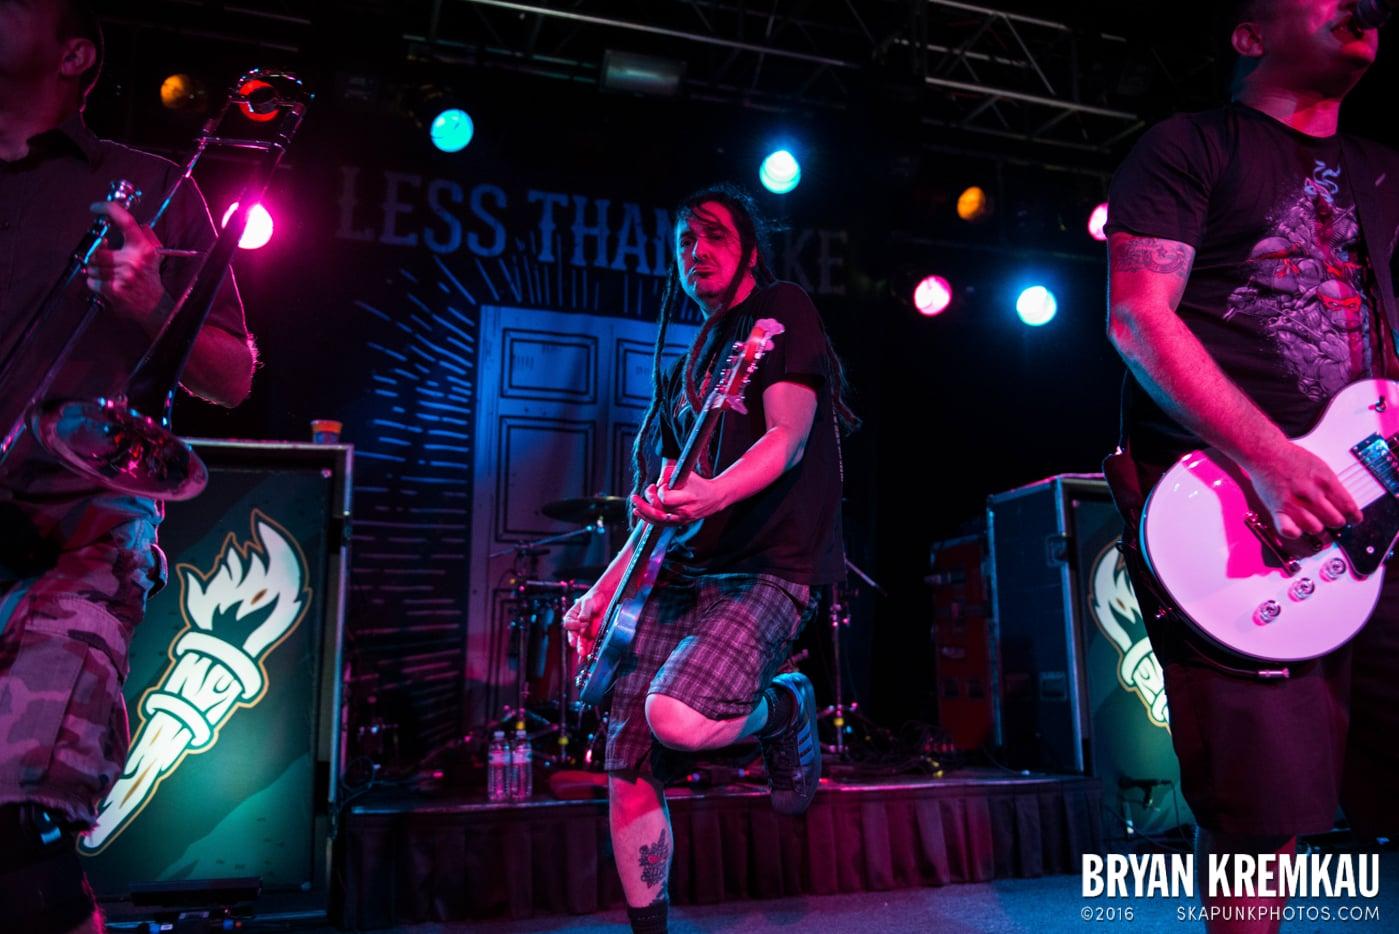 Less Than Jake @ Starland Ballroom, Sayreville, NJ - 11.9.13 (8)